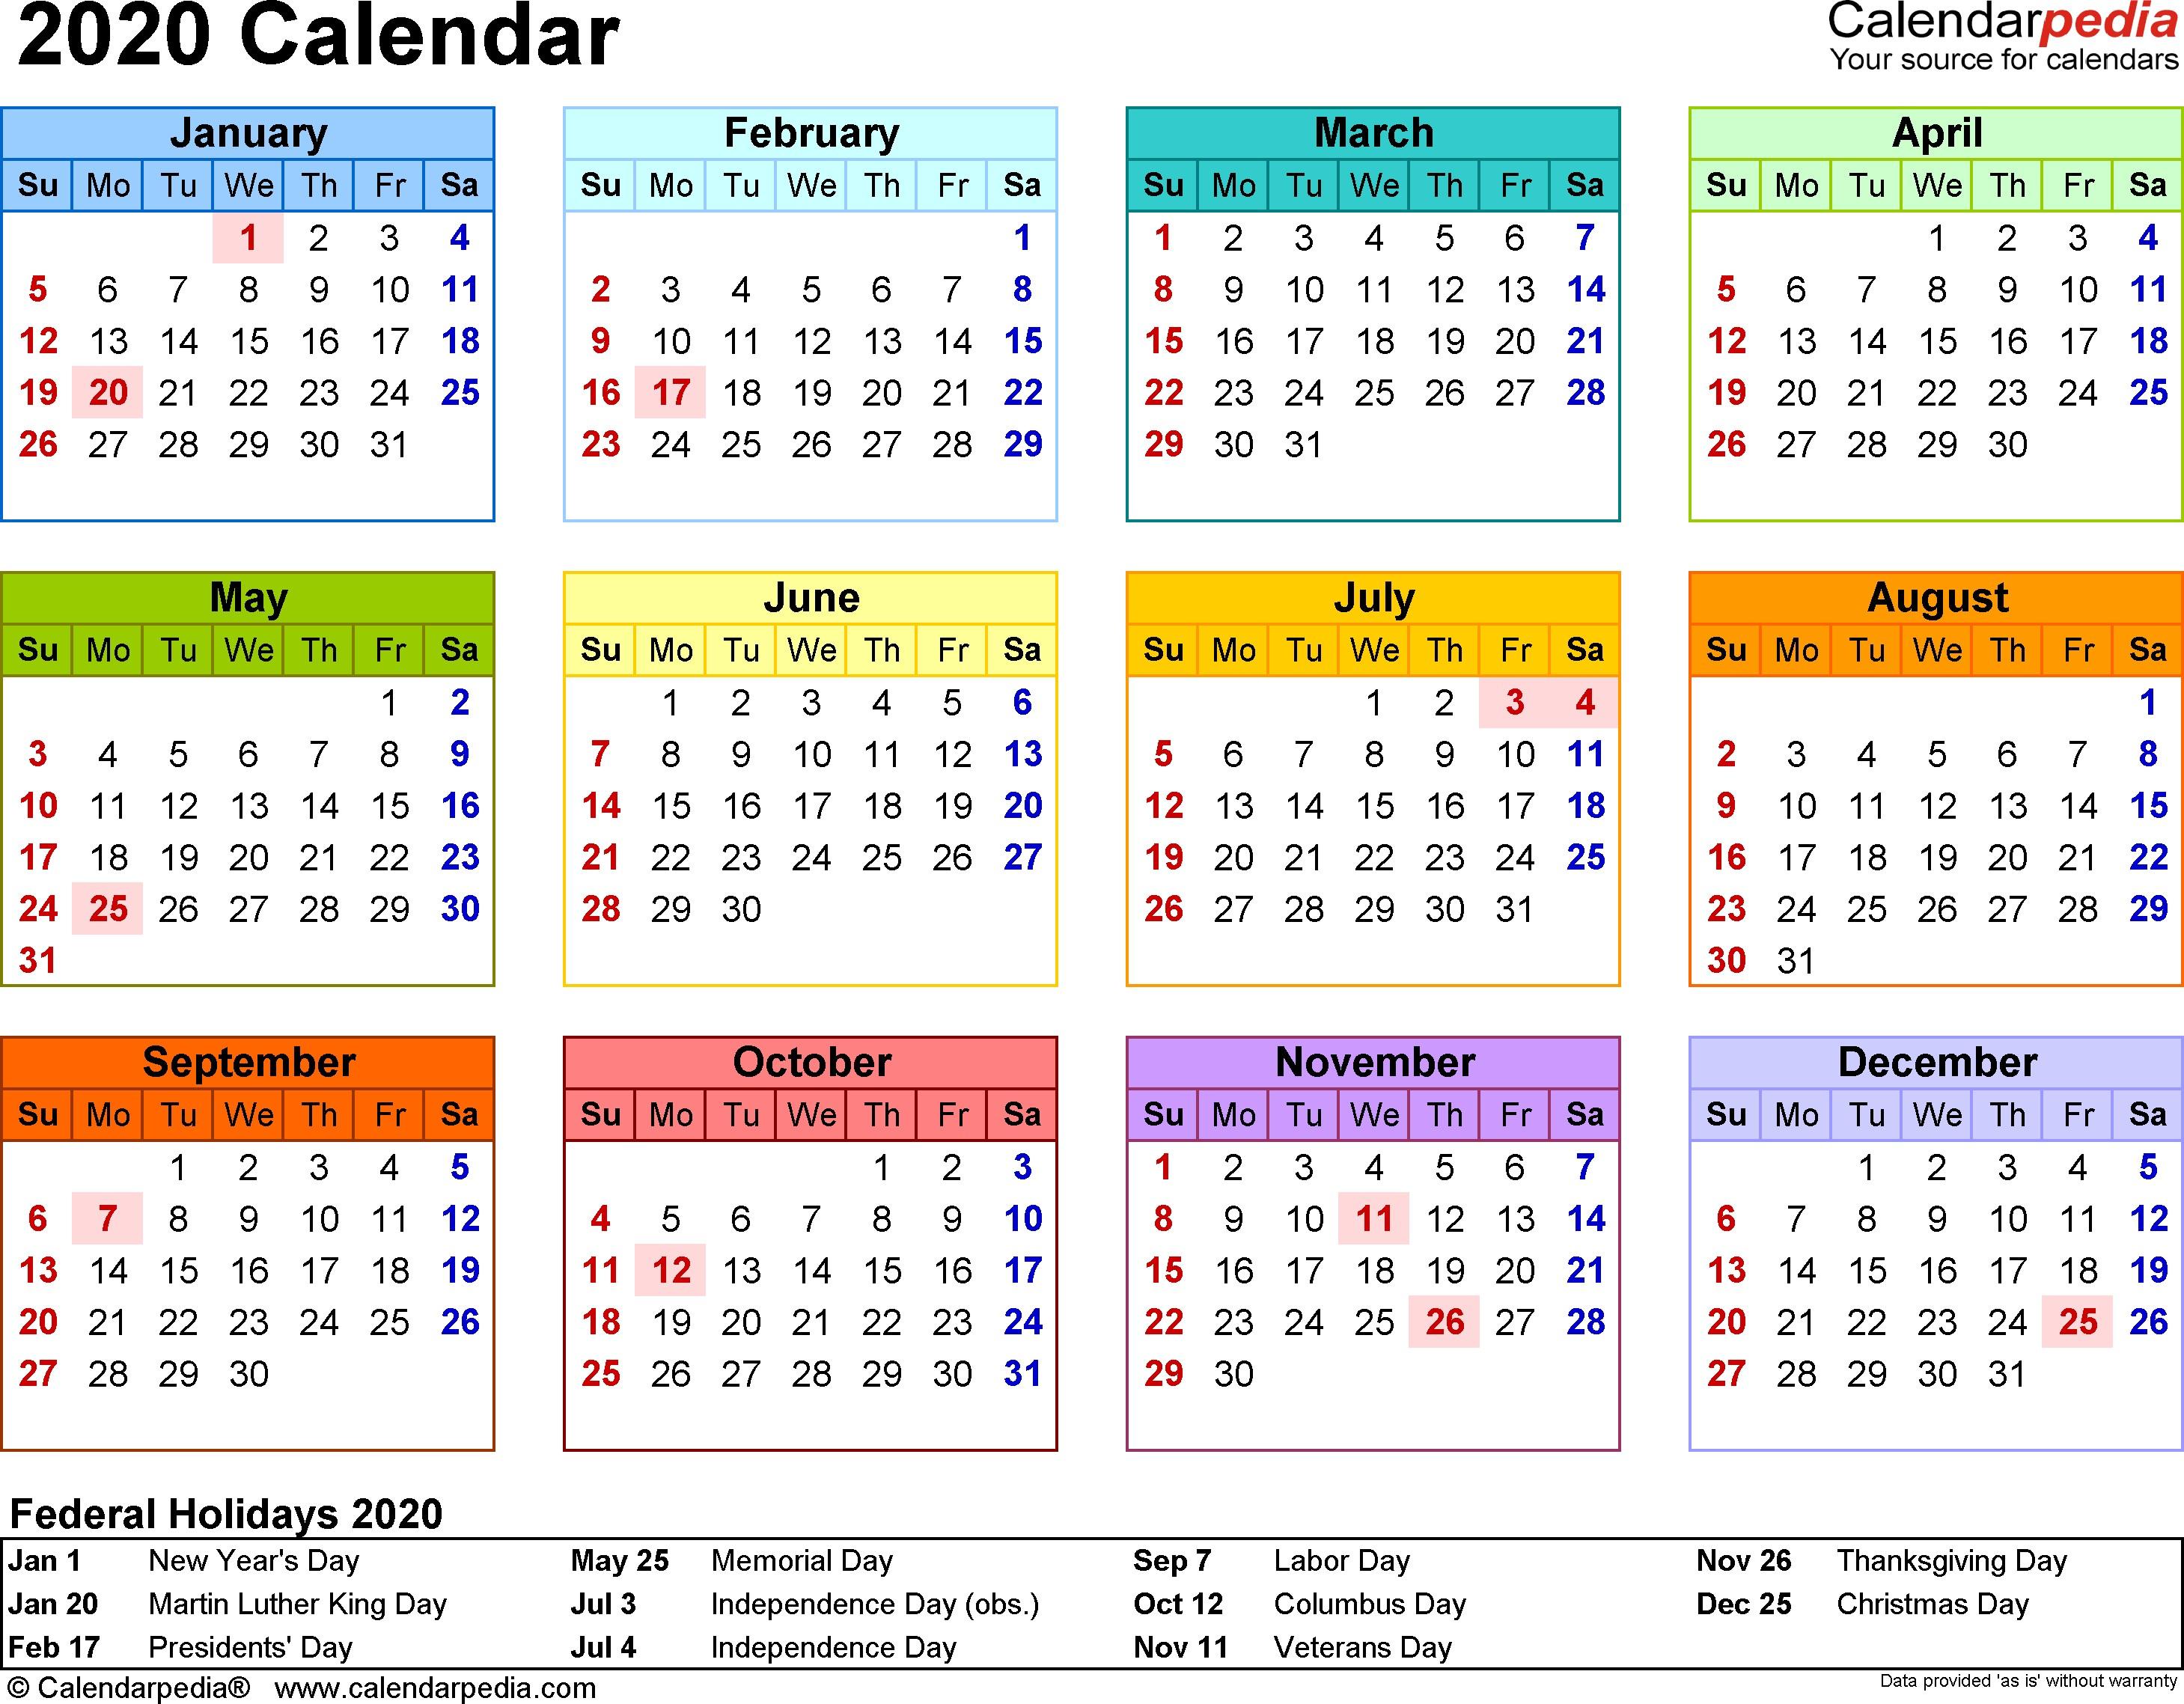 2020 Free Printable Calendars Printable Yearly Calendars 2020